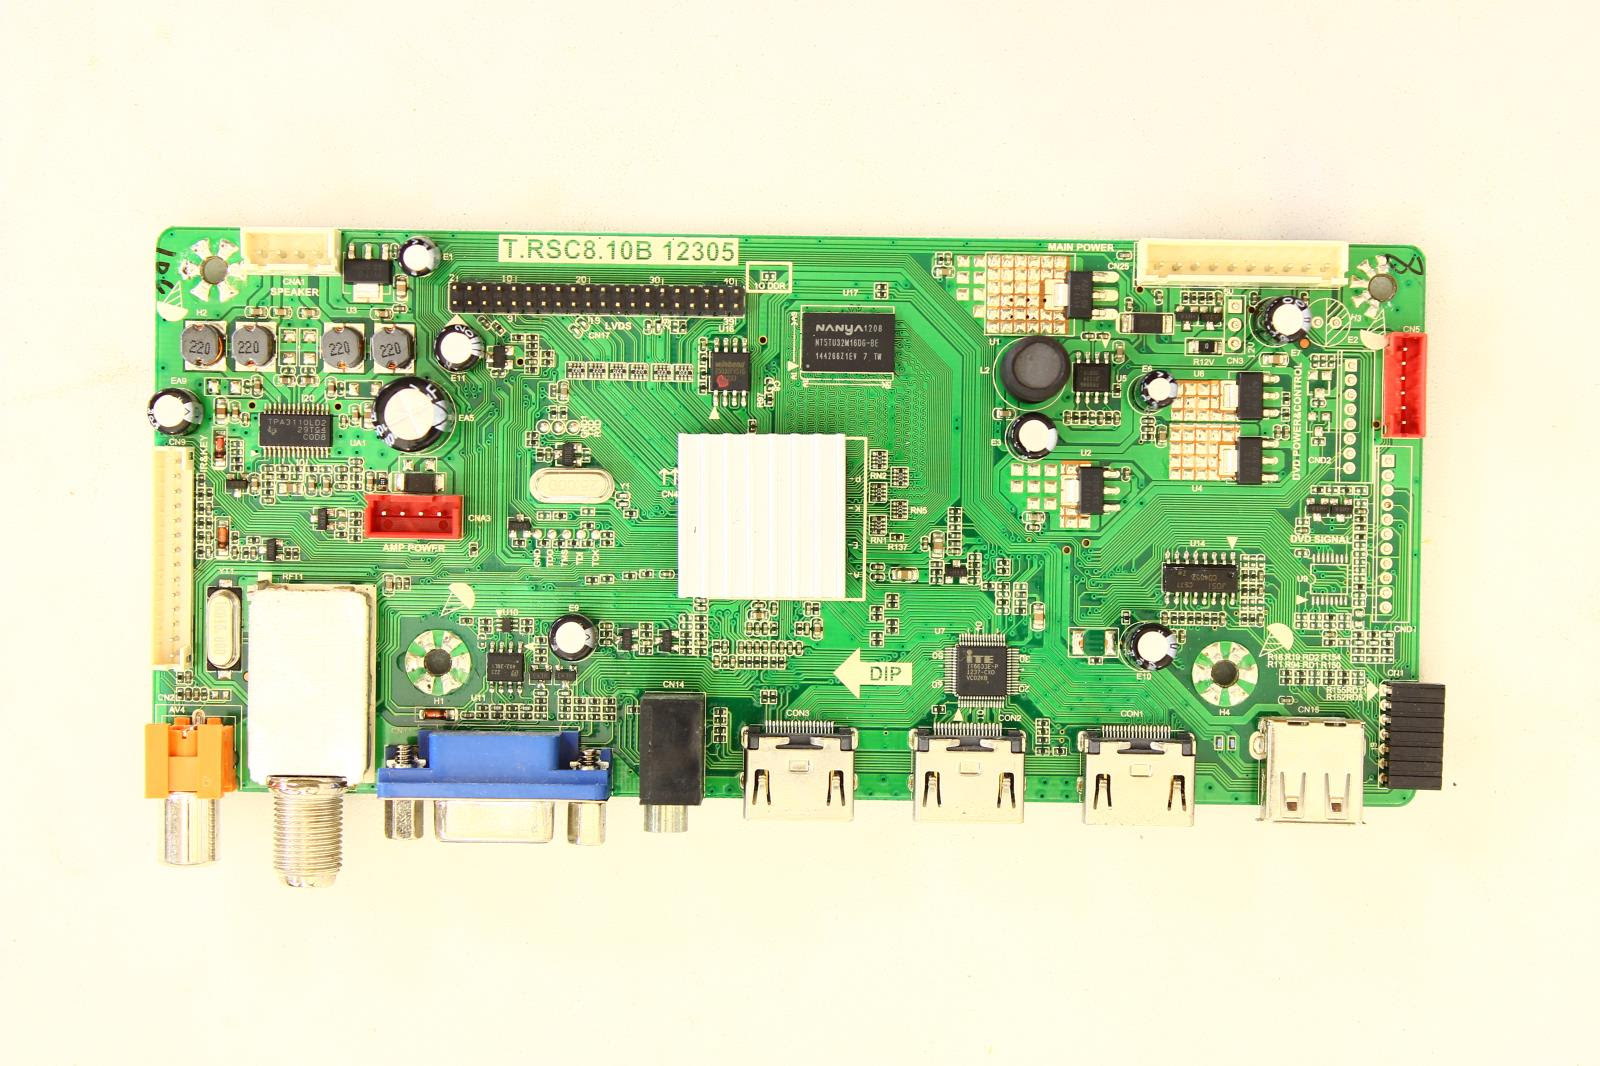 Sceptre X322bv Hd Main Board C12090007 Tvparts At Tvpartsinstock